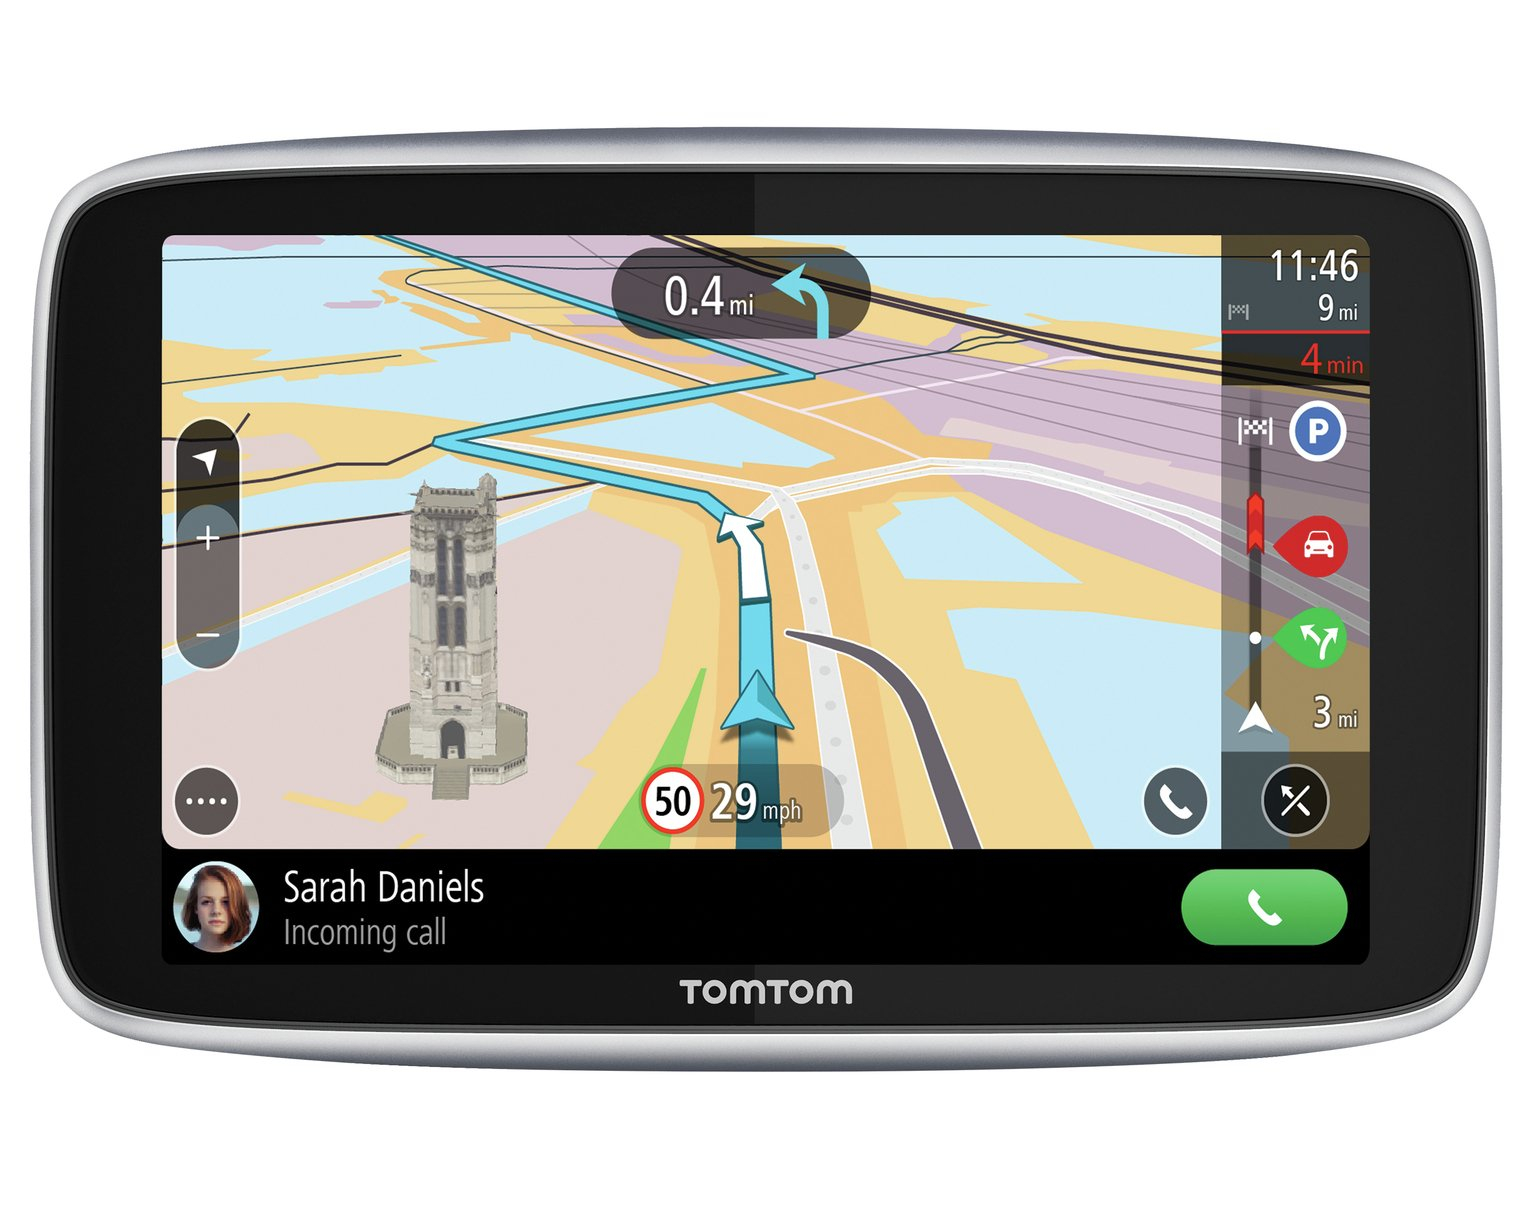 TomTom G0 Premium 5 In Sat Nav with World Maps,Traffic&WiFi